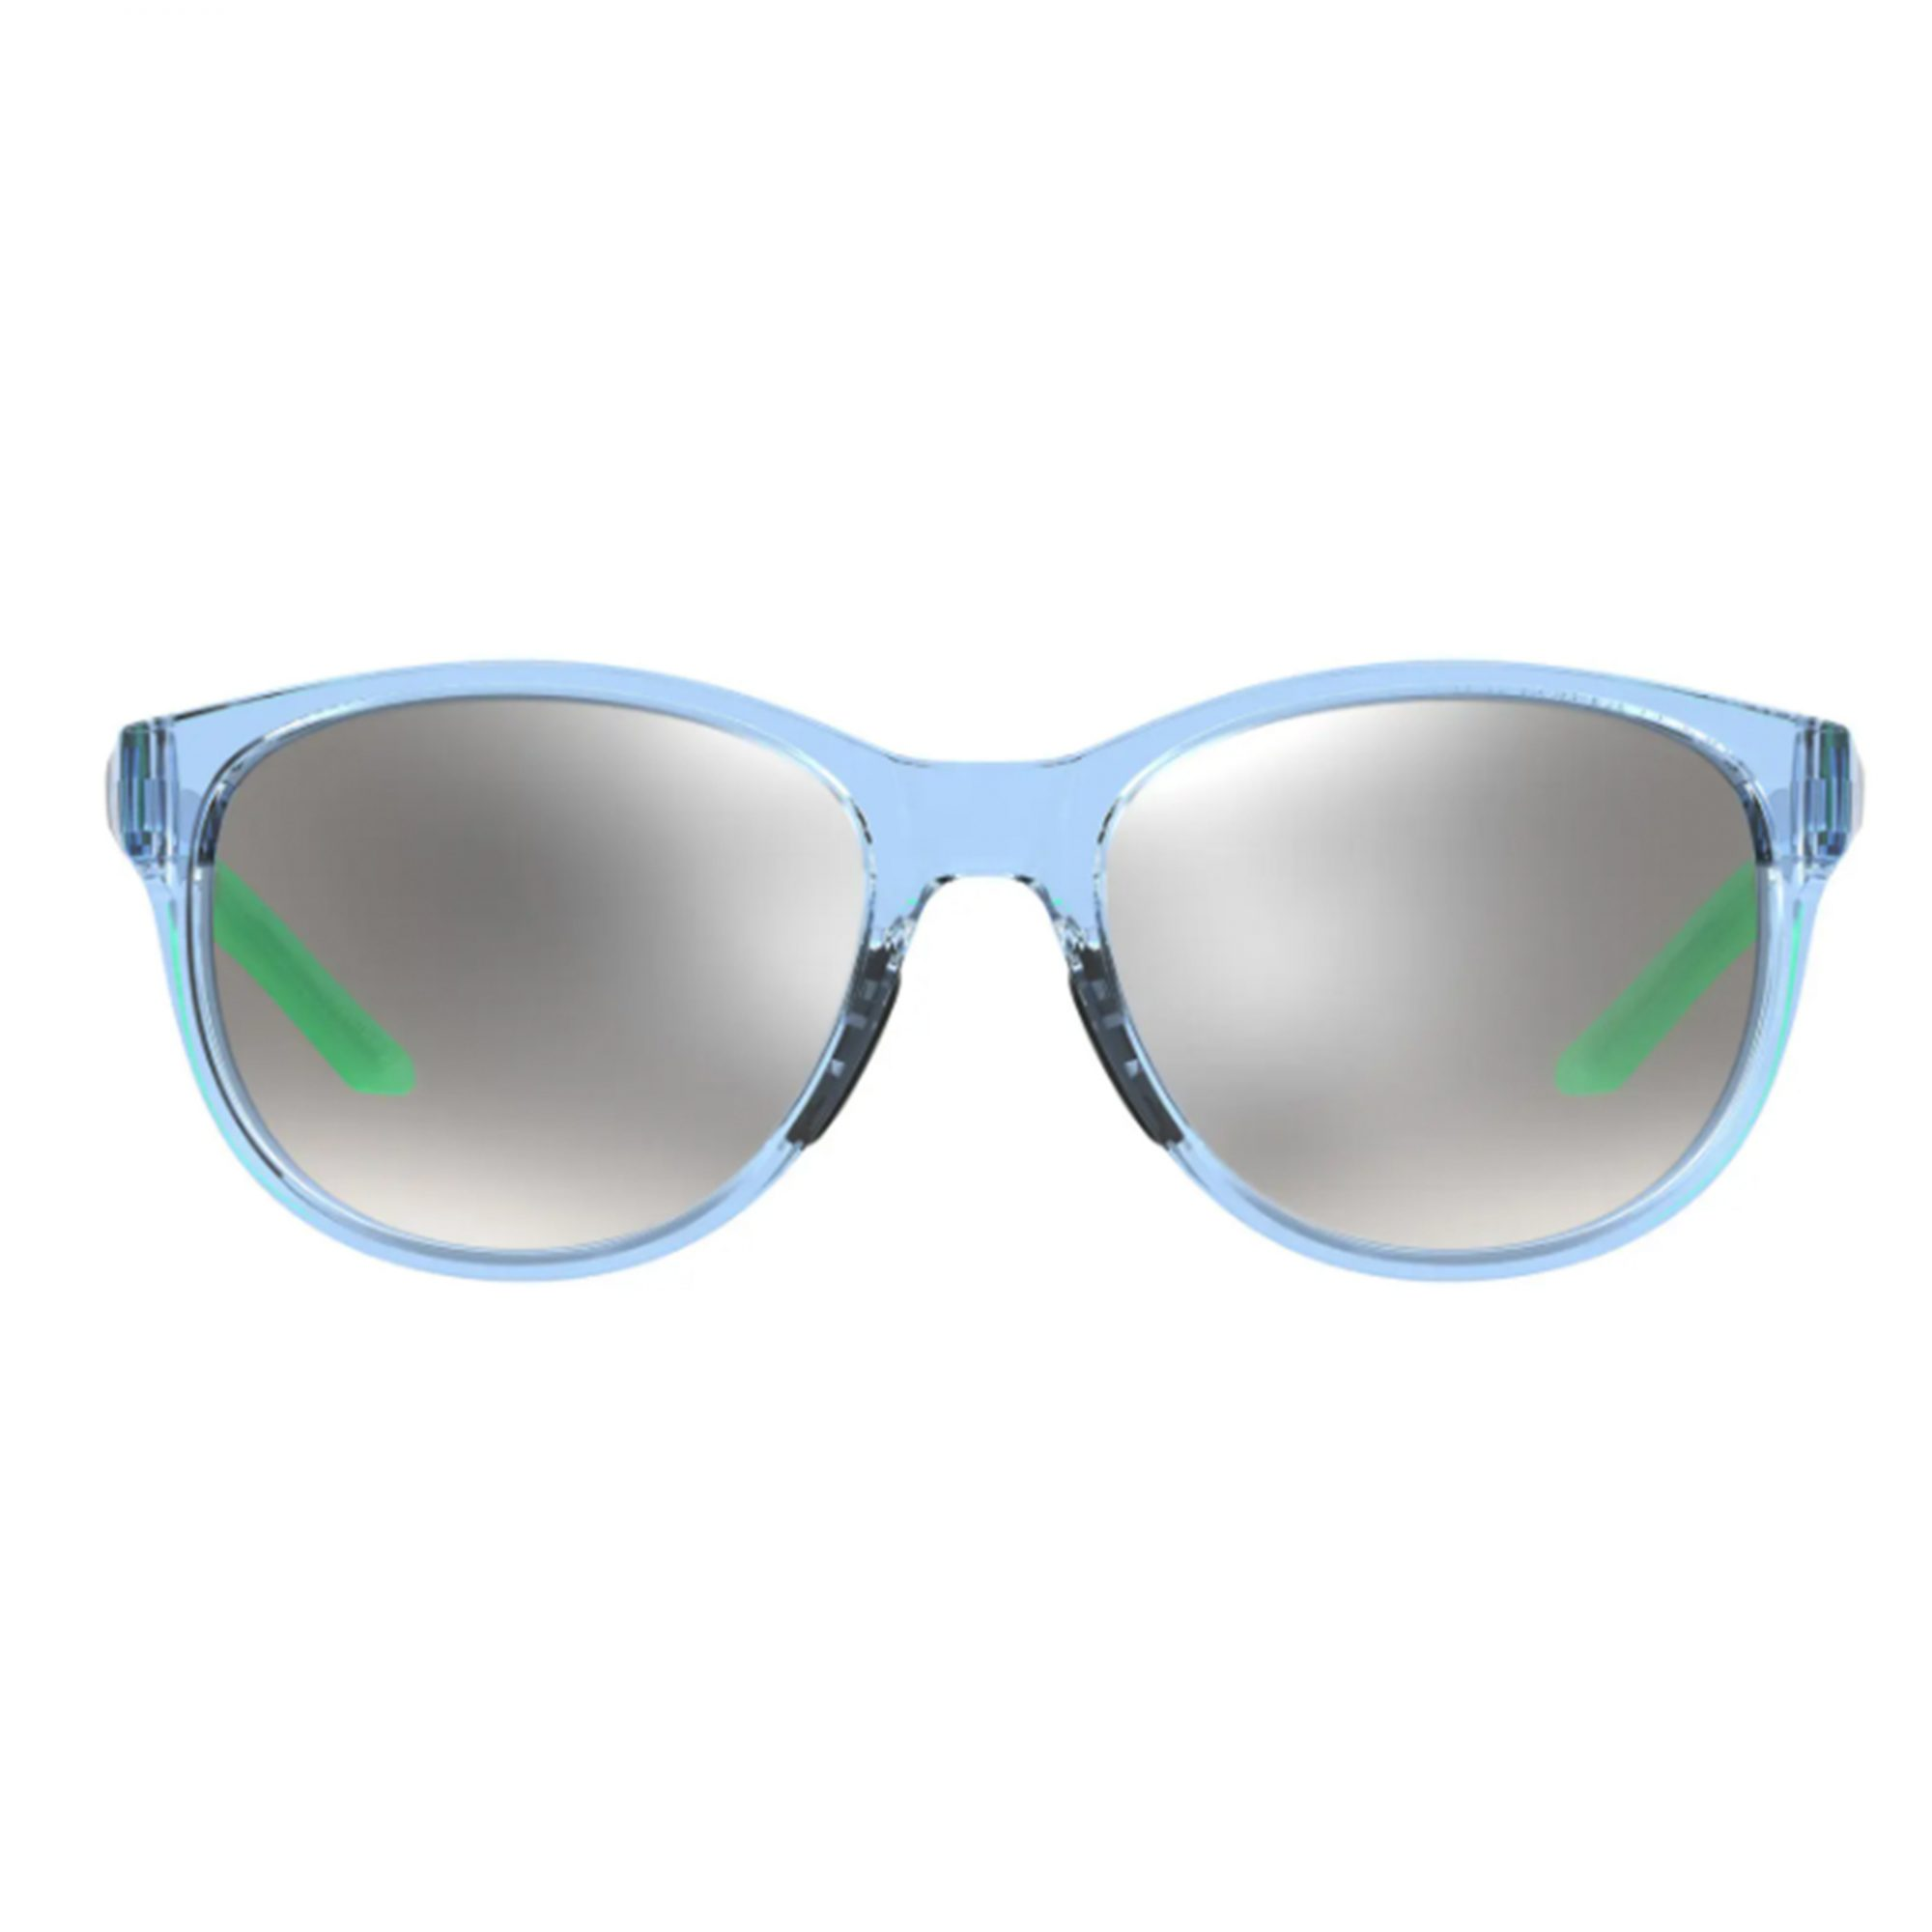 under-armour-mirrored-sunglasses